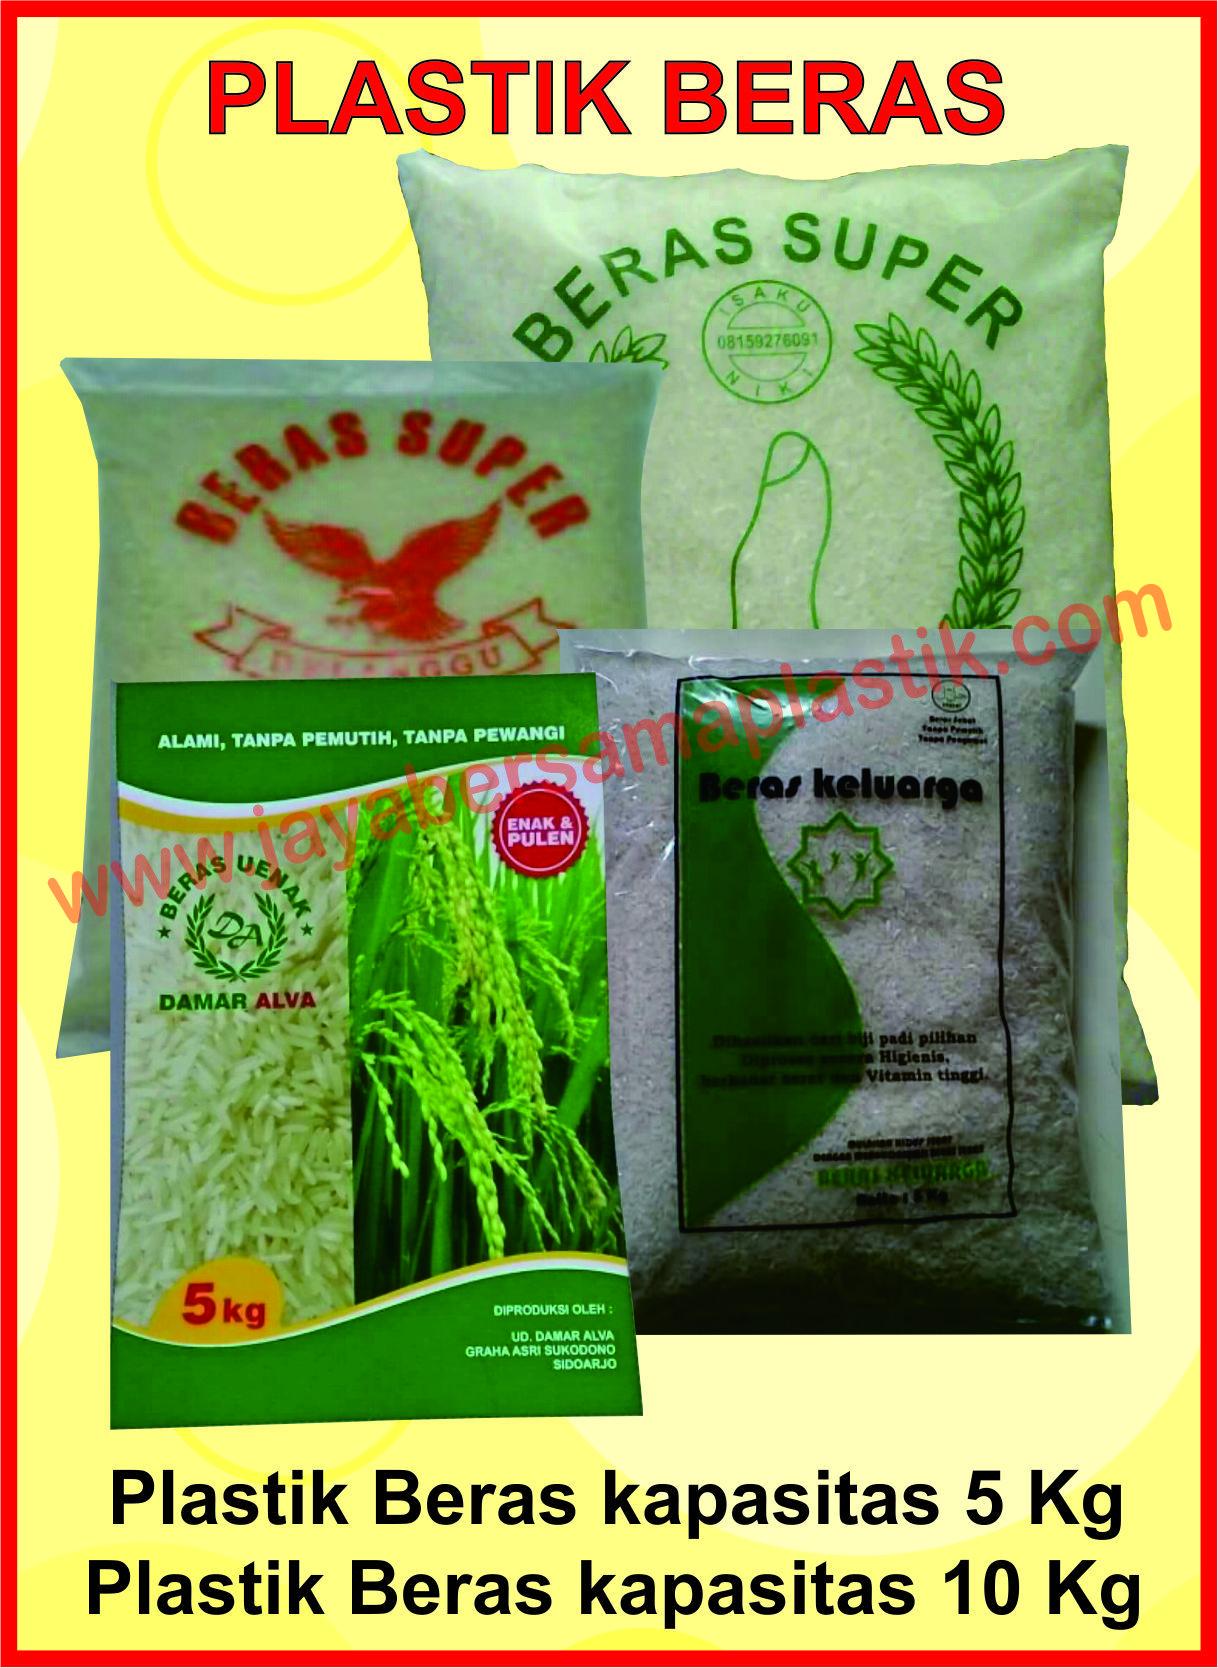 Pabrik Plastik, Distributor Plastik, Supplier Plastik, Grosir Plastik Surabaya, Produksi Plastik Surabaya